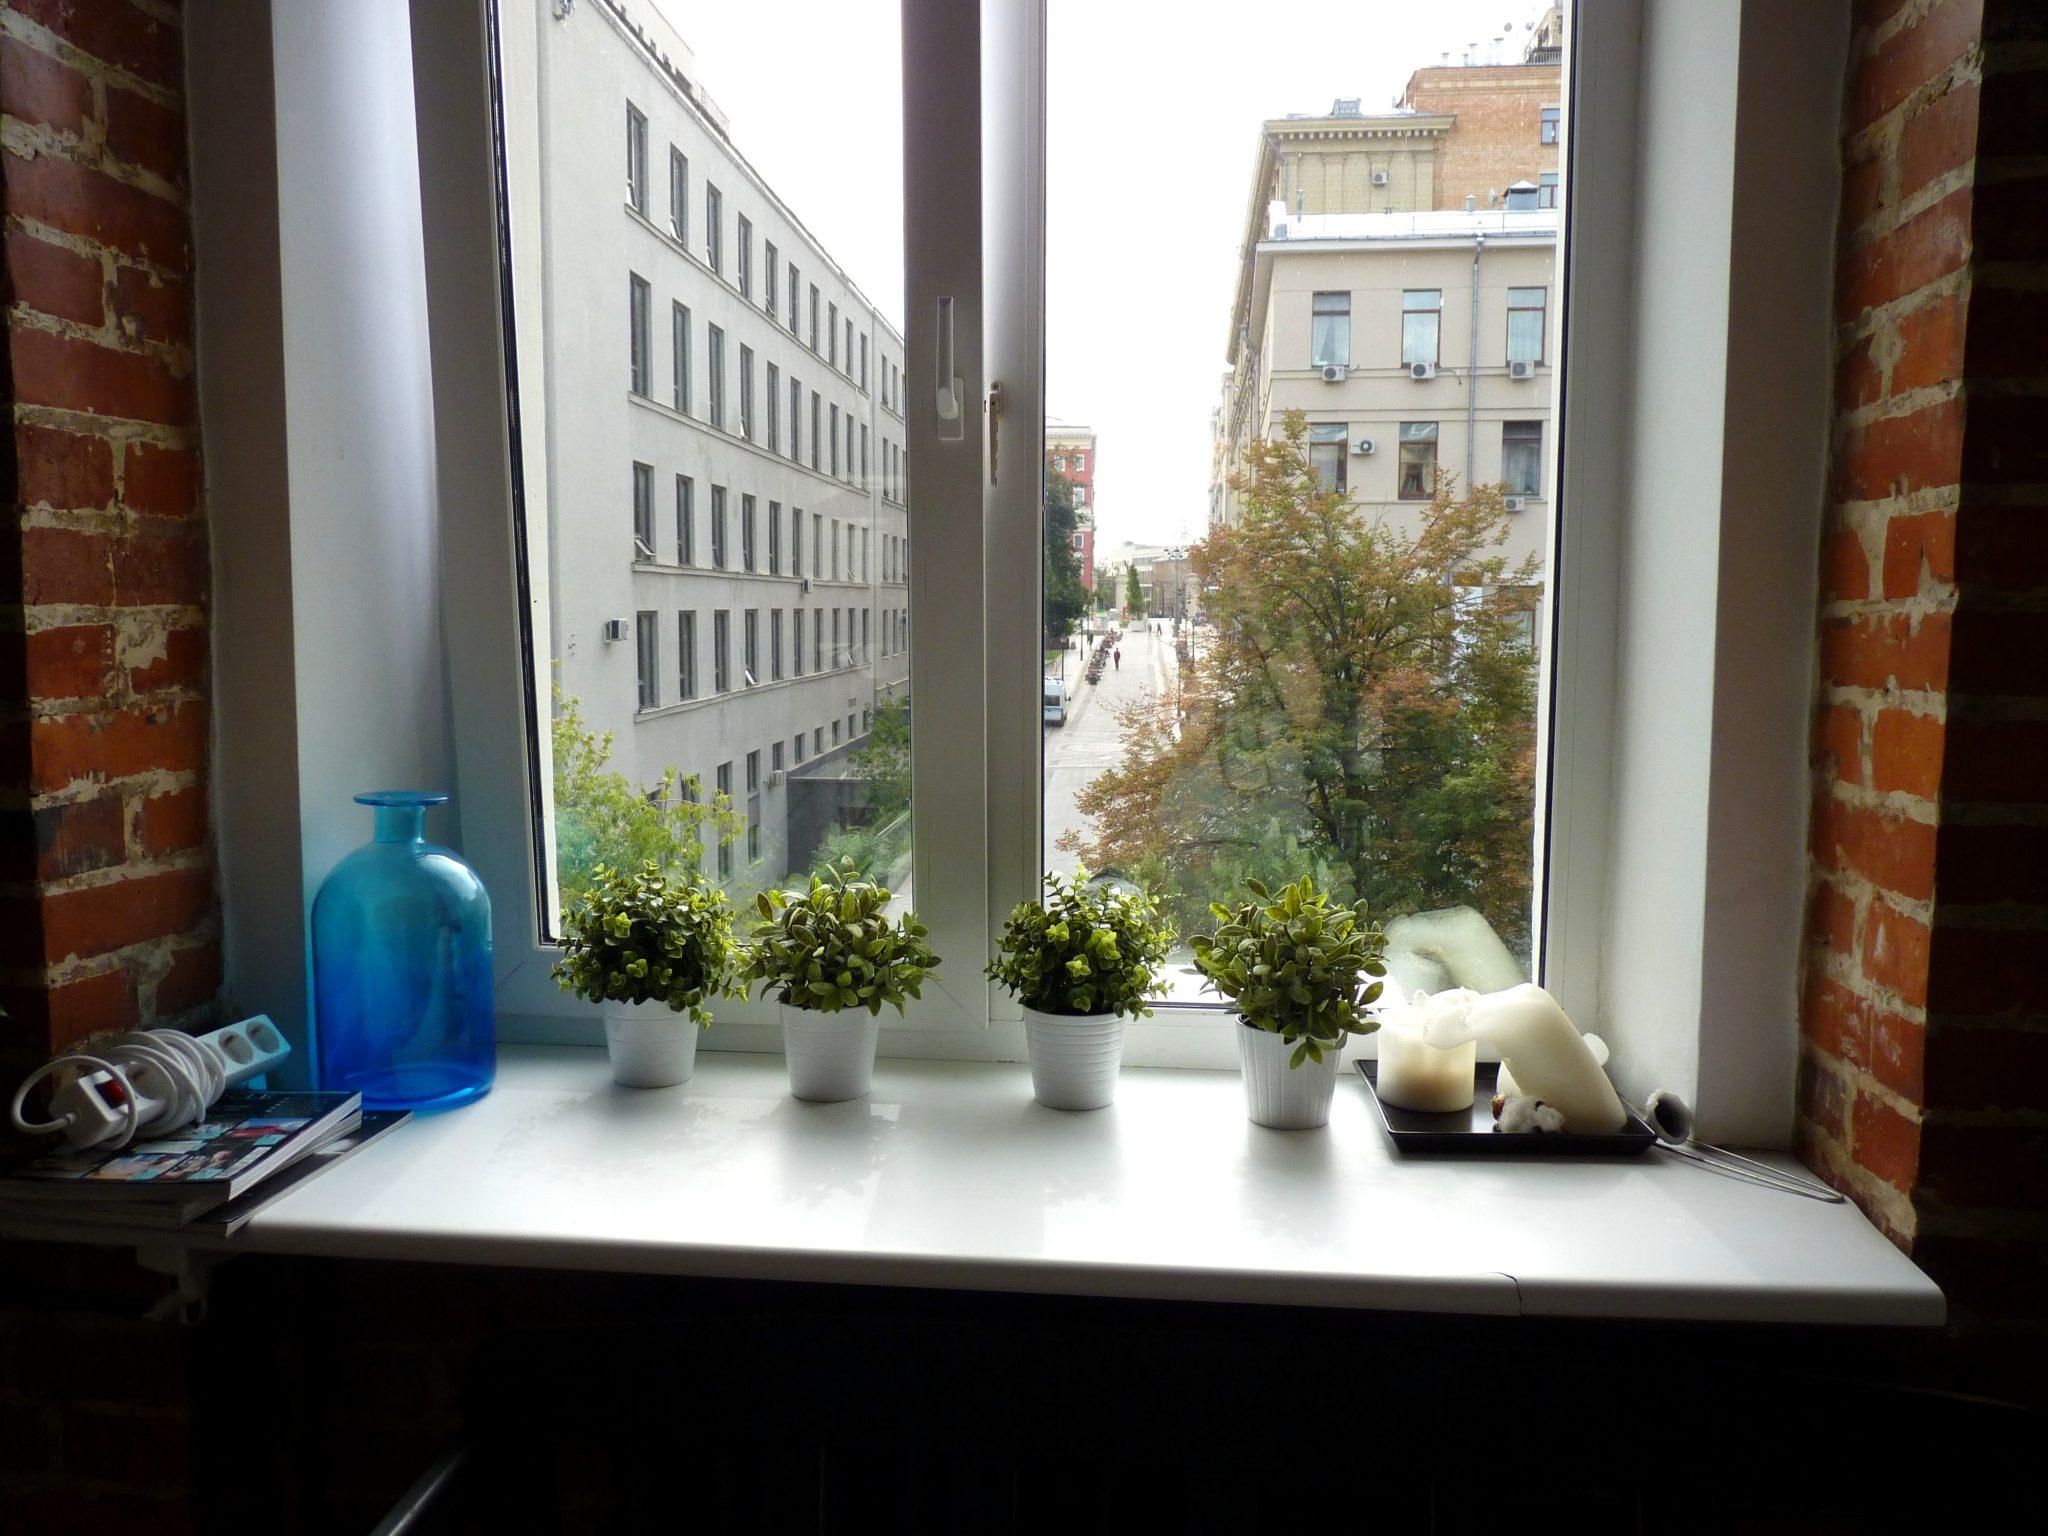 Sputnik Hostel and Personal Space vista Moscovo Rússia Mundo Indefinido